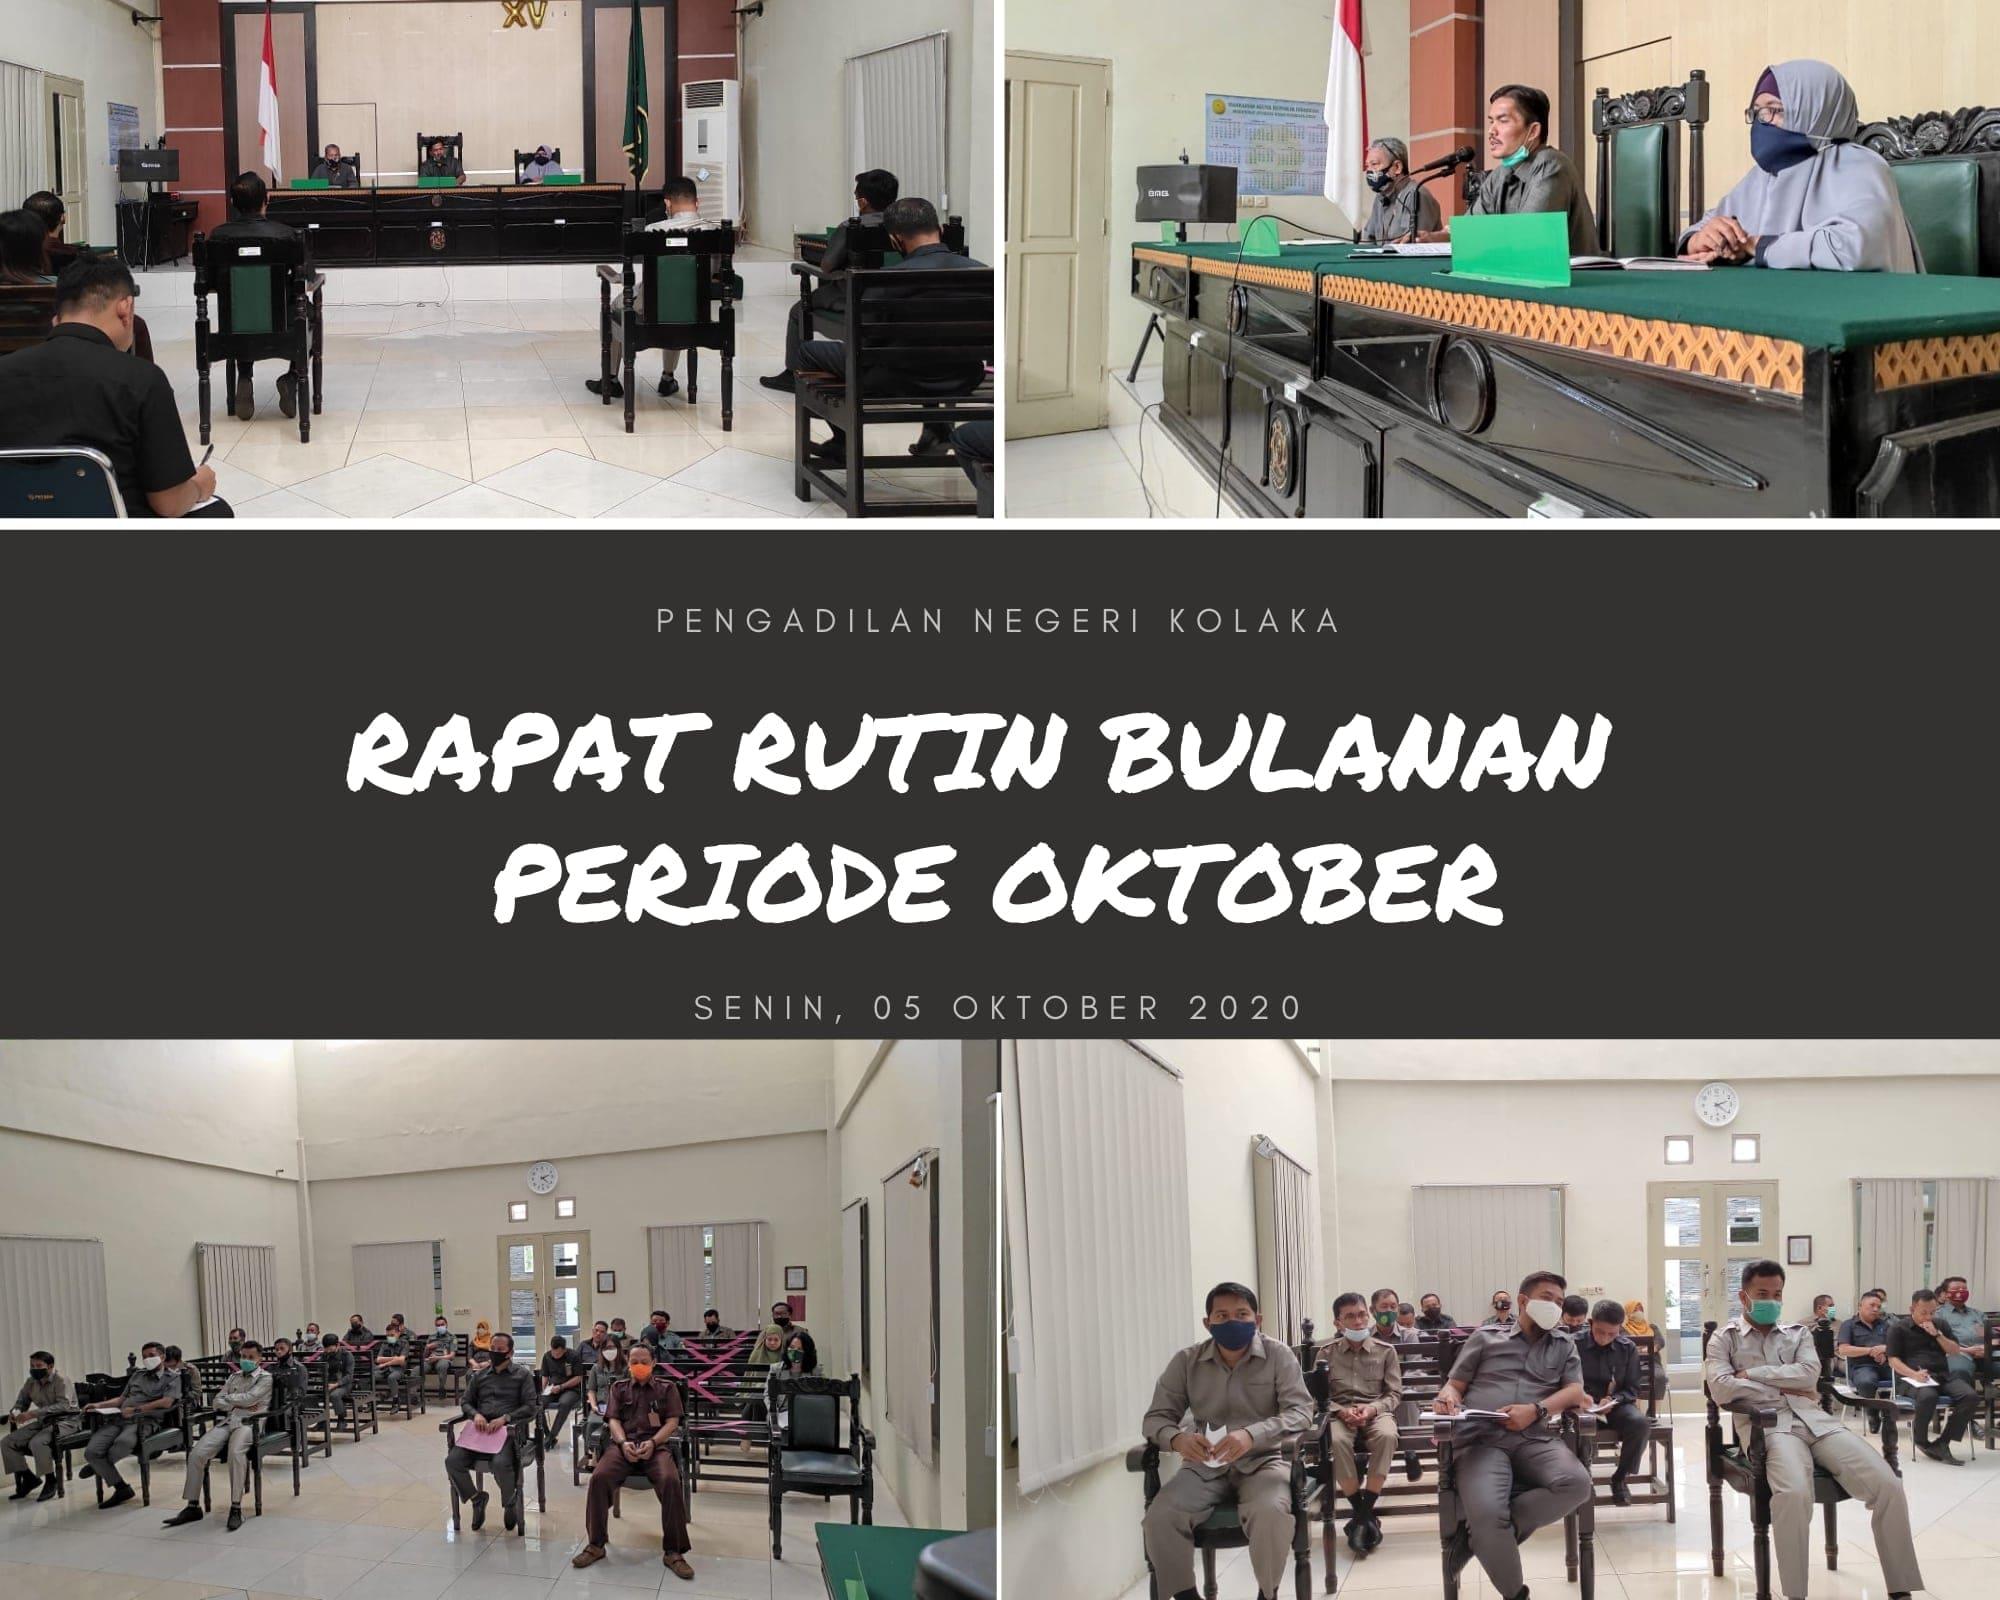 Rapat rutin bulanan periode Oktober 2020